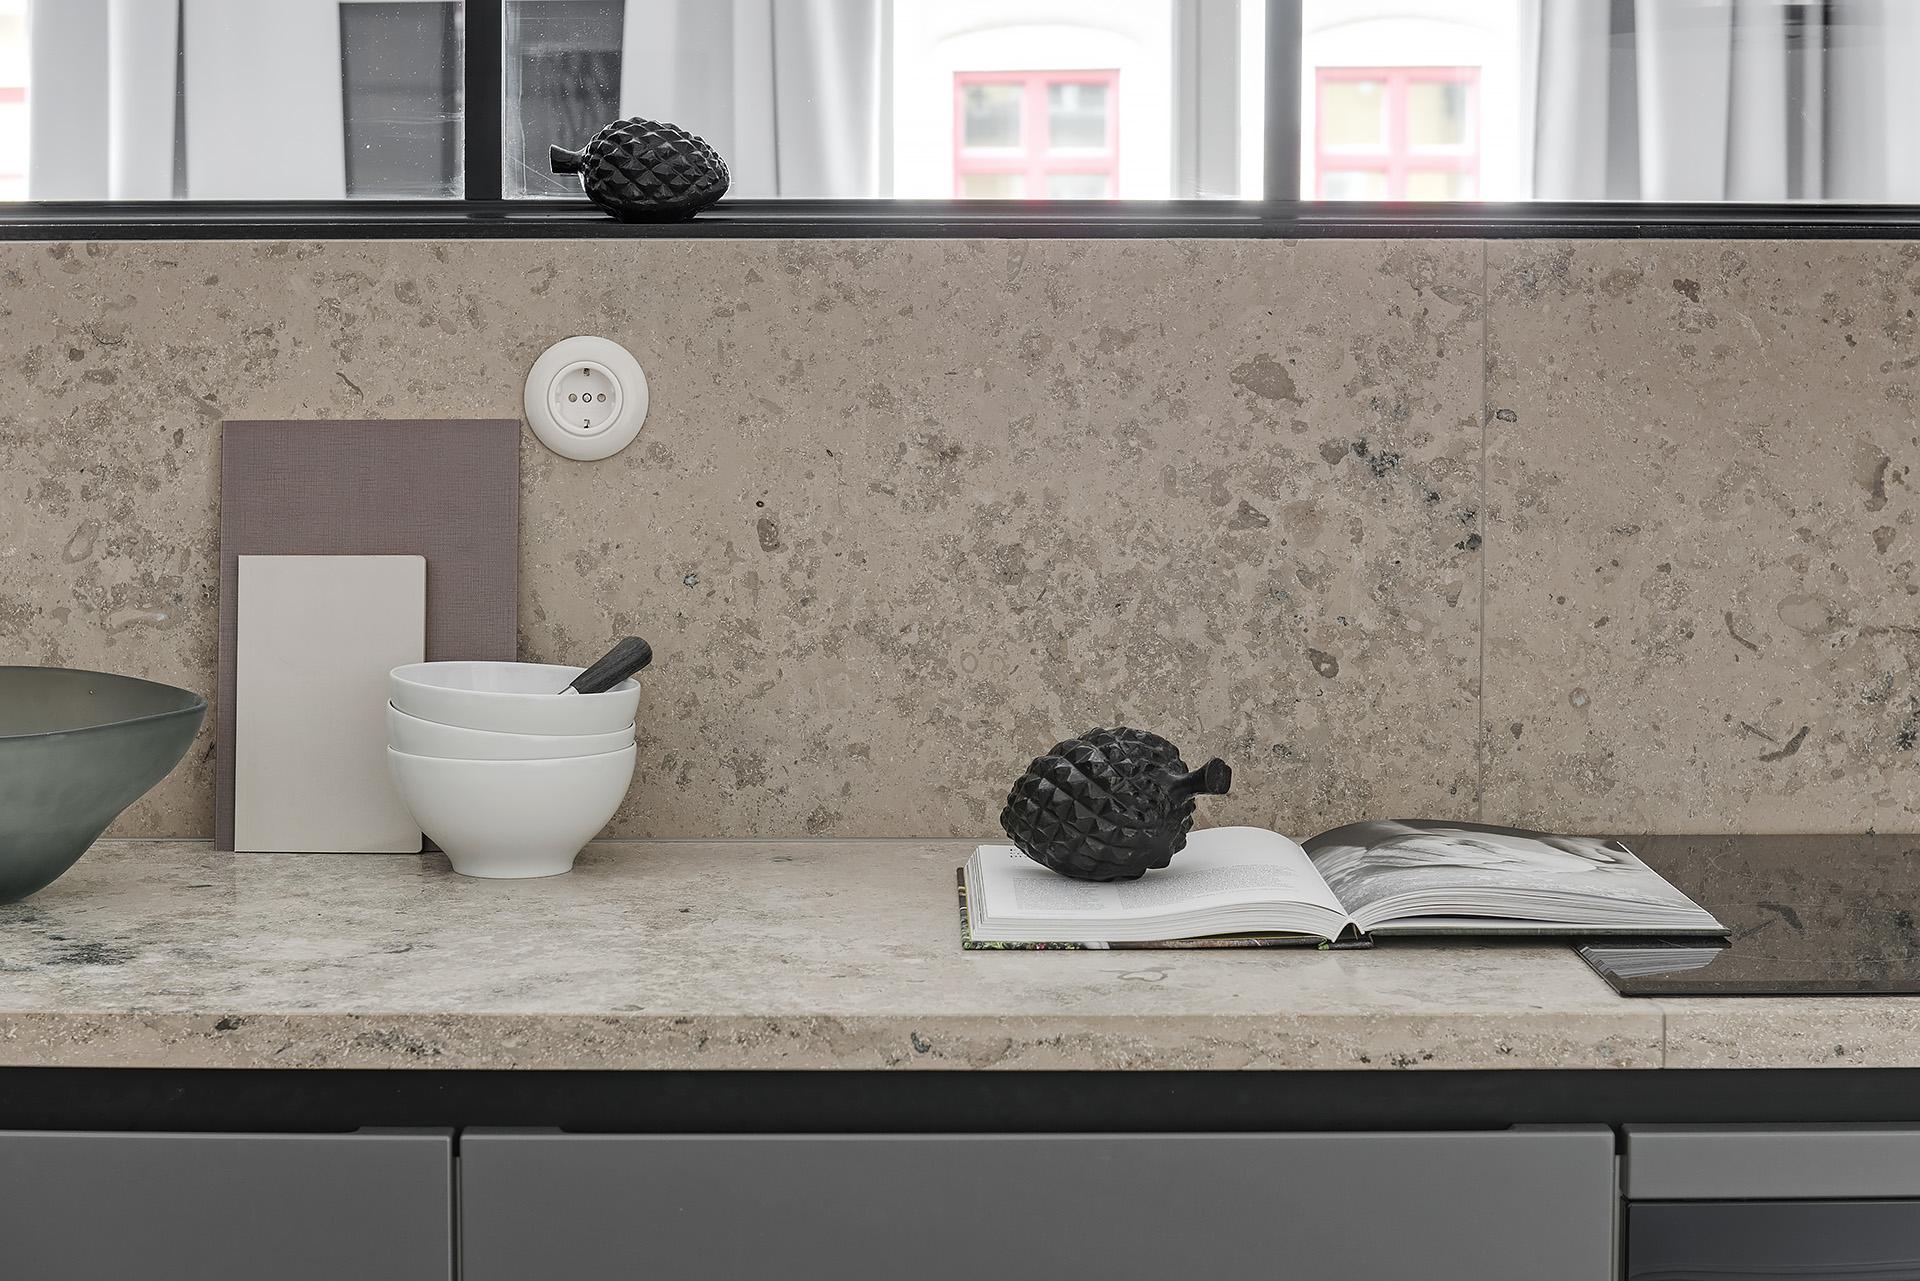 кухонная мебель столешница мрамор камень